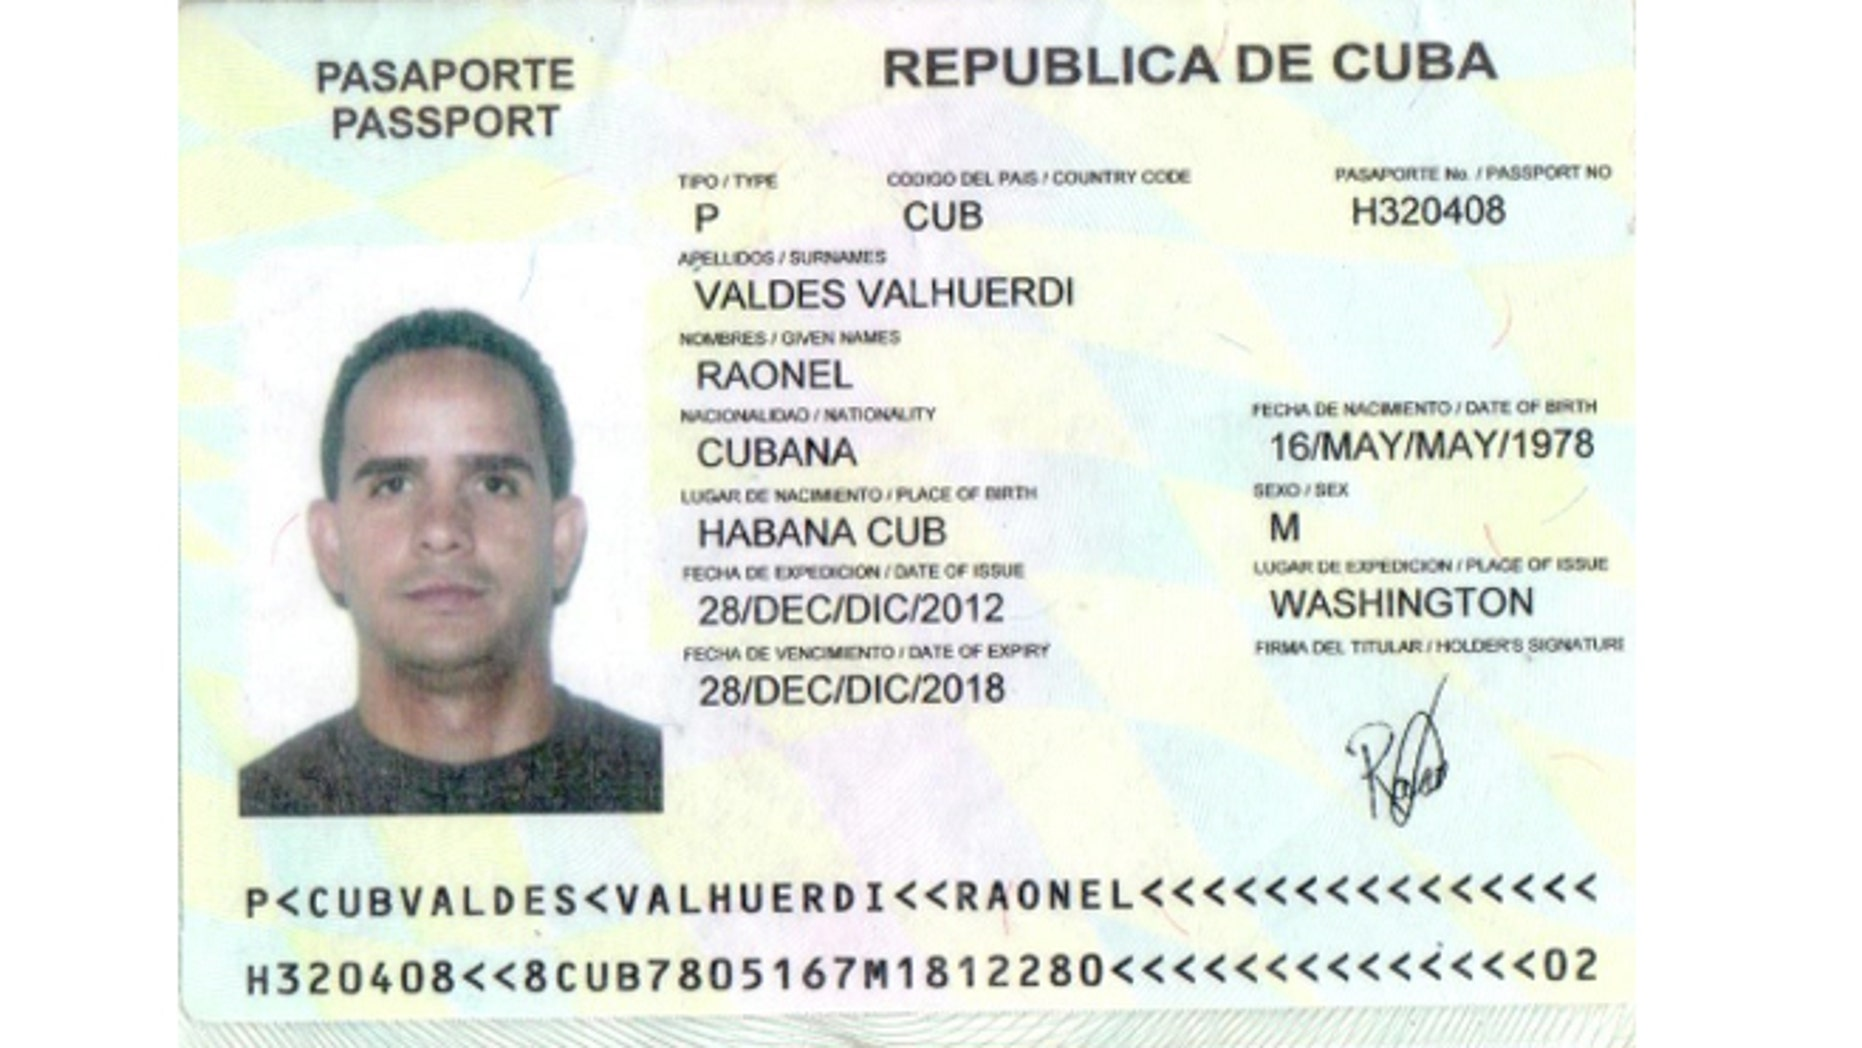 A photo of the passport of Raonel Valdez.